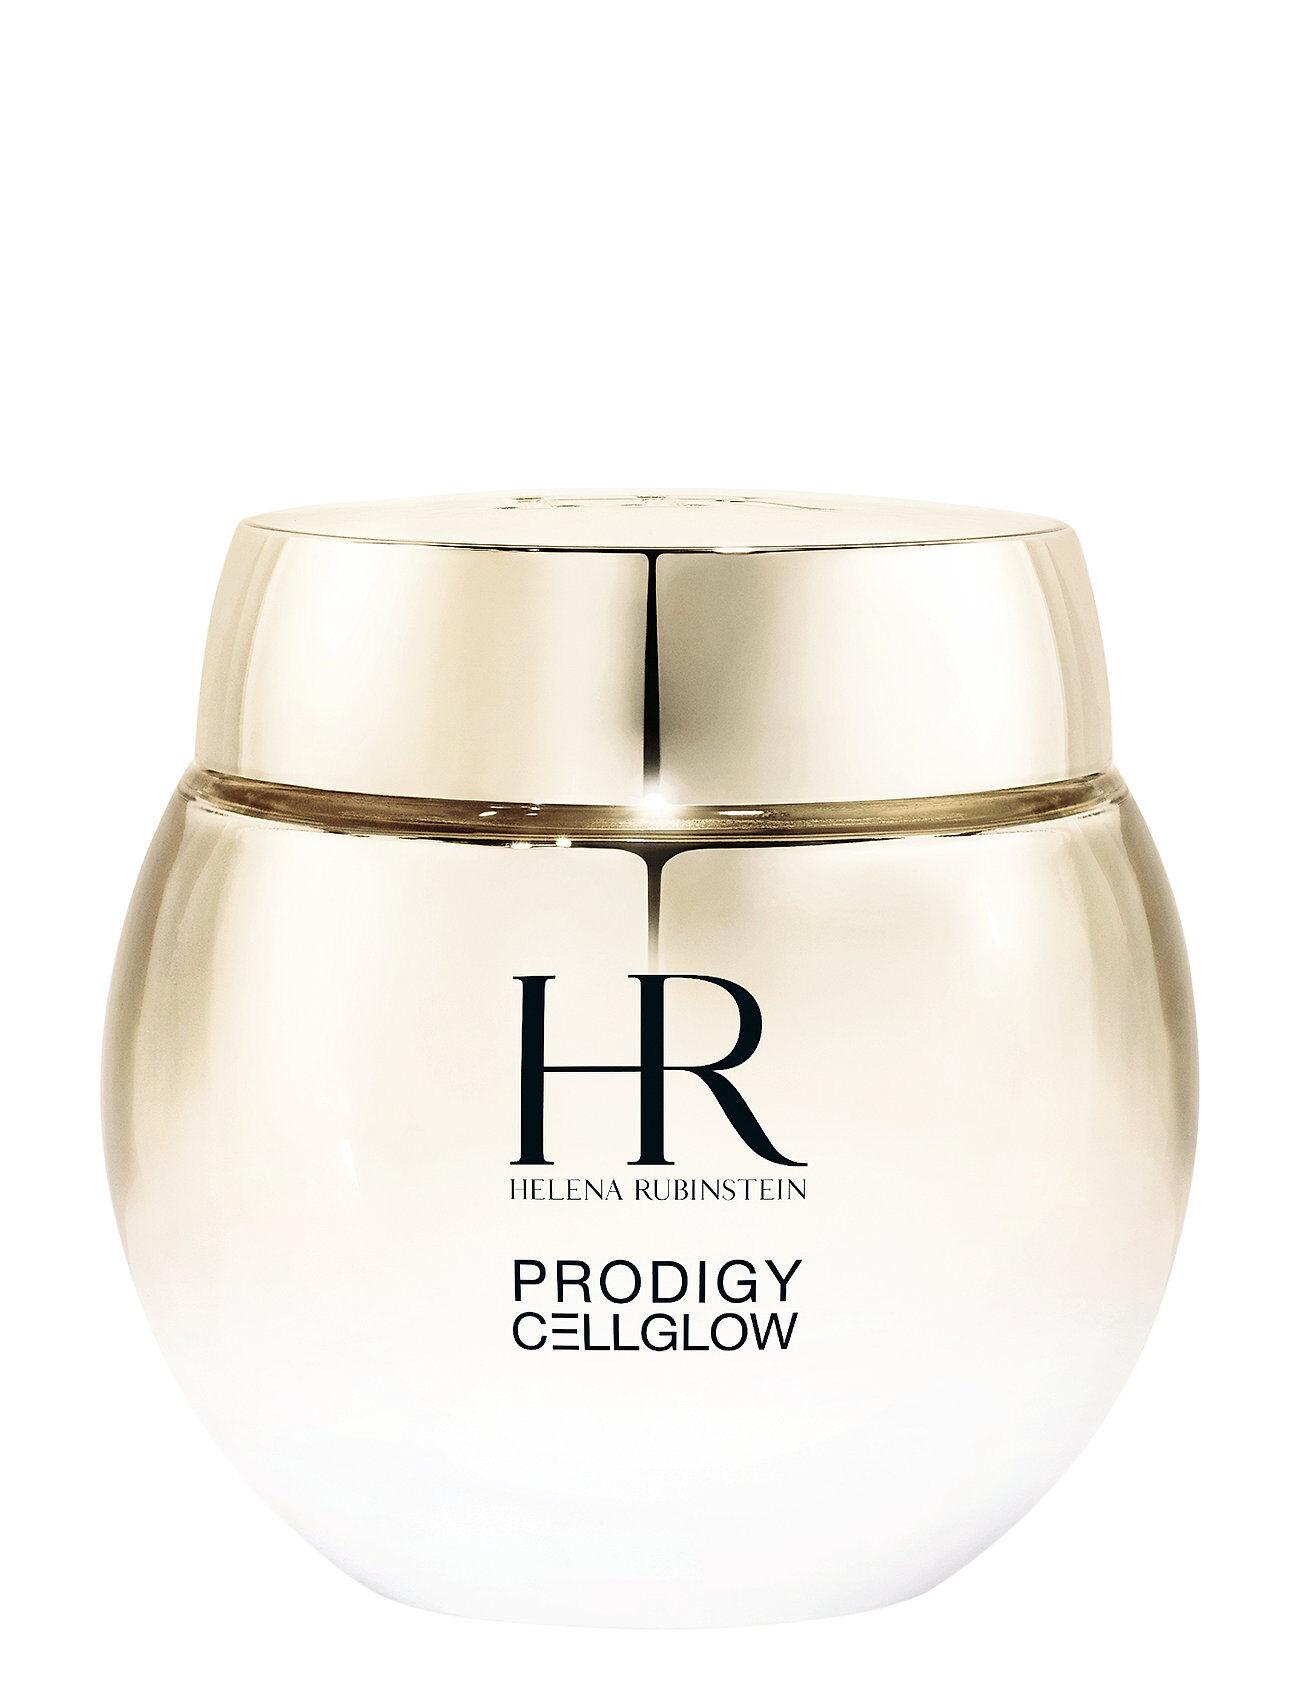 Helena Rubinstein Prodigy Life Glow Rosy Cream 50 Ml